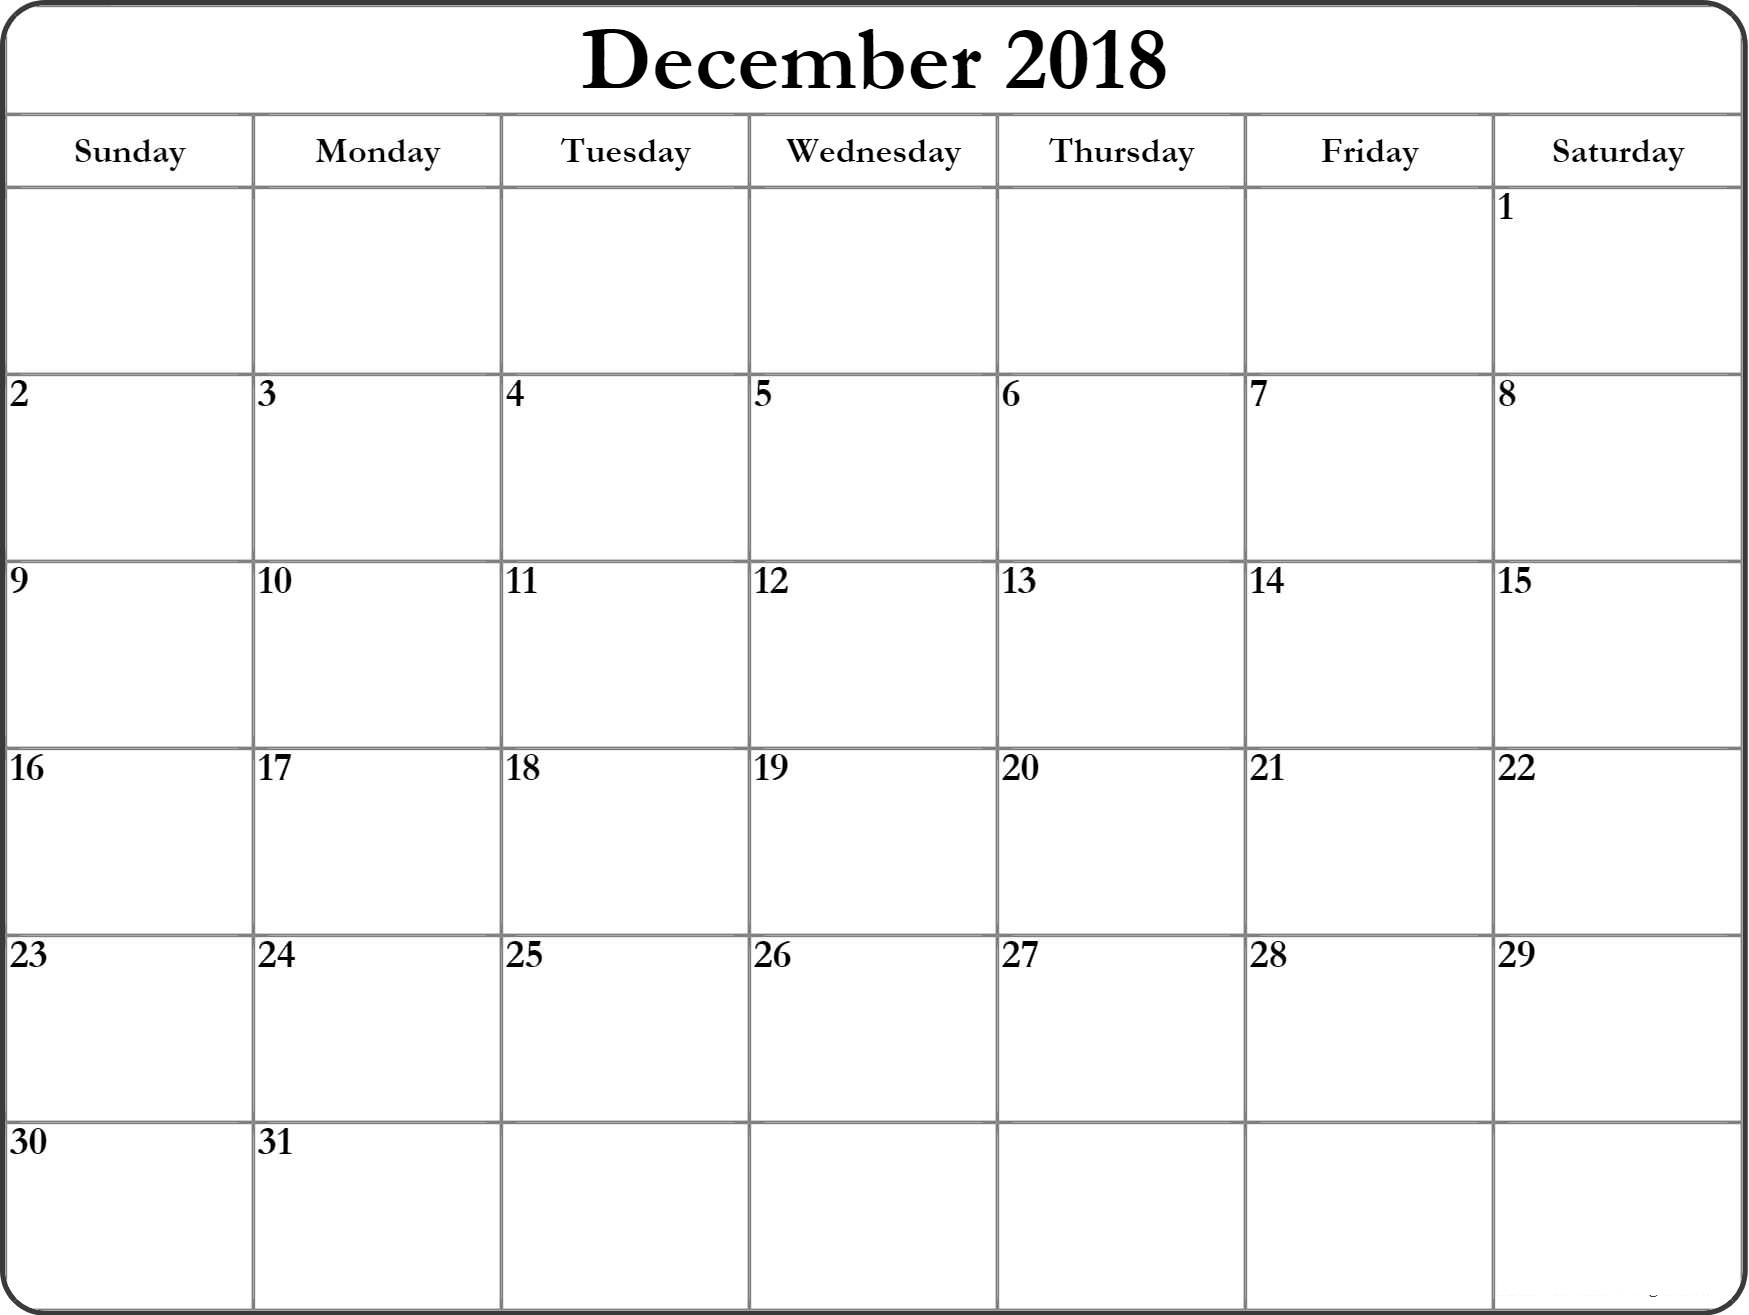 Calendar December 2018 In Word - Printable Calendar 2019| Blank with regard to Printable Blank Calendar For December